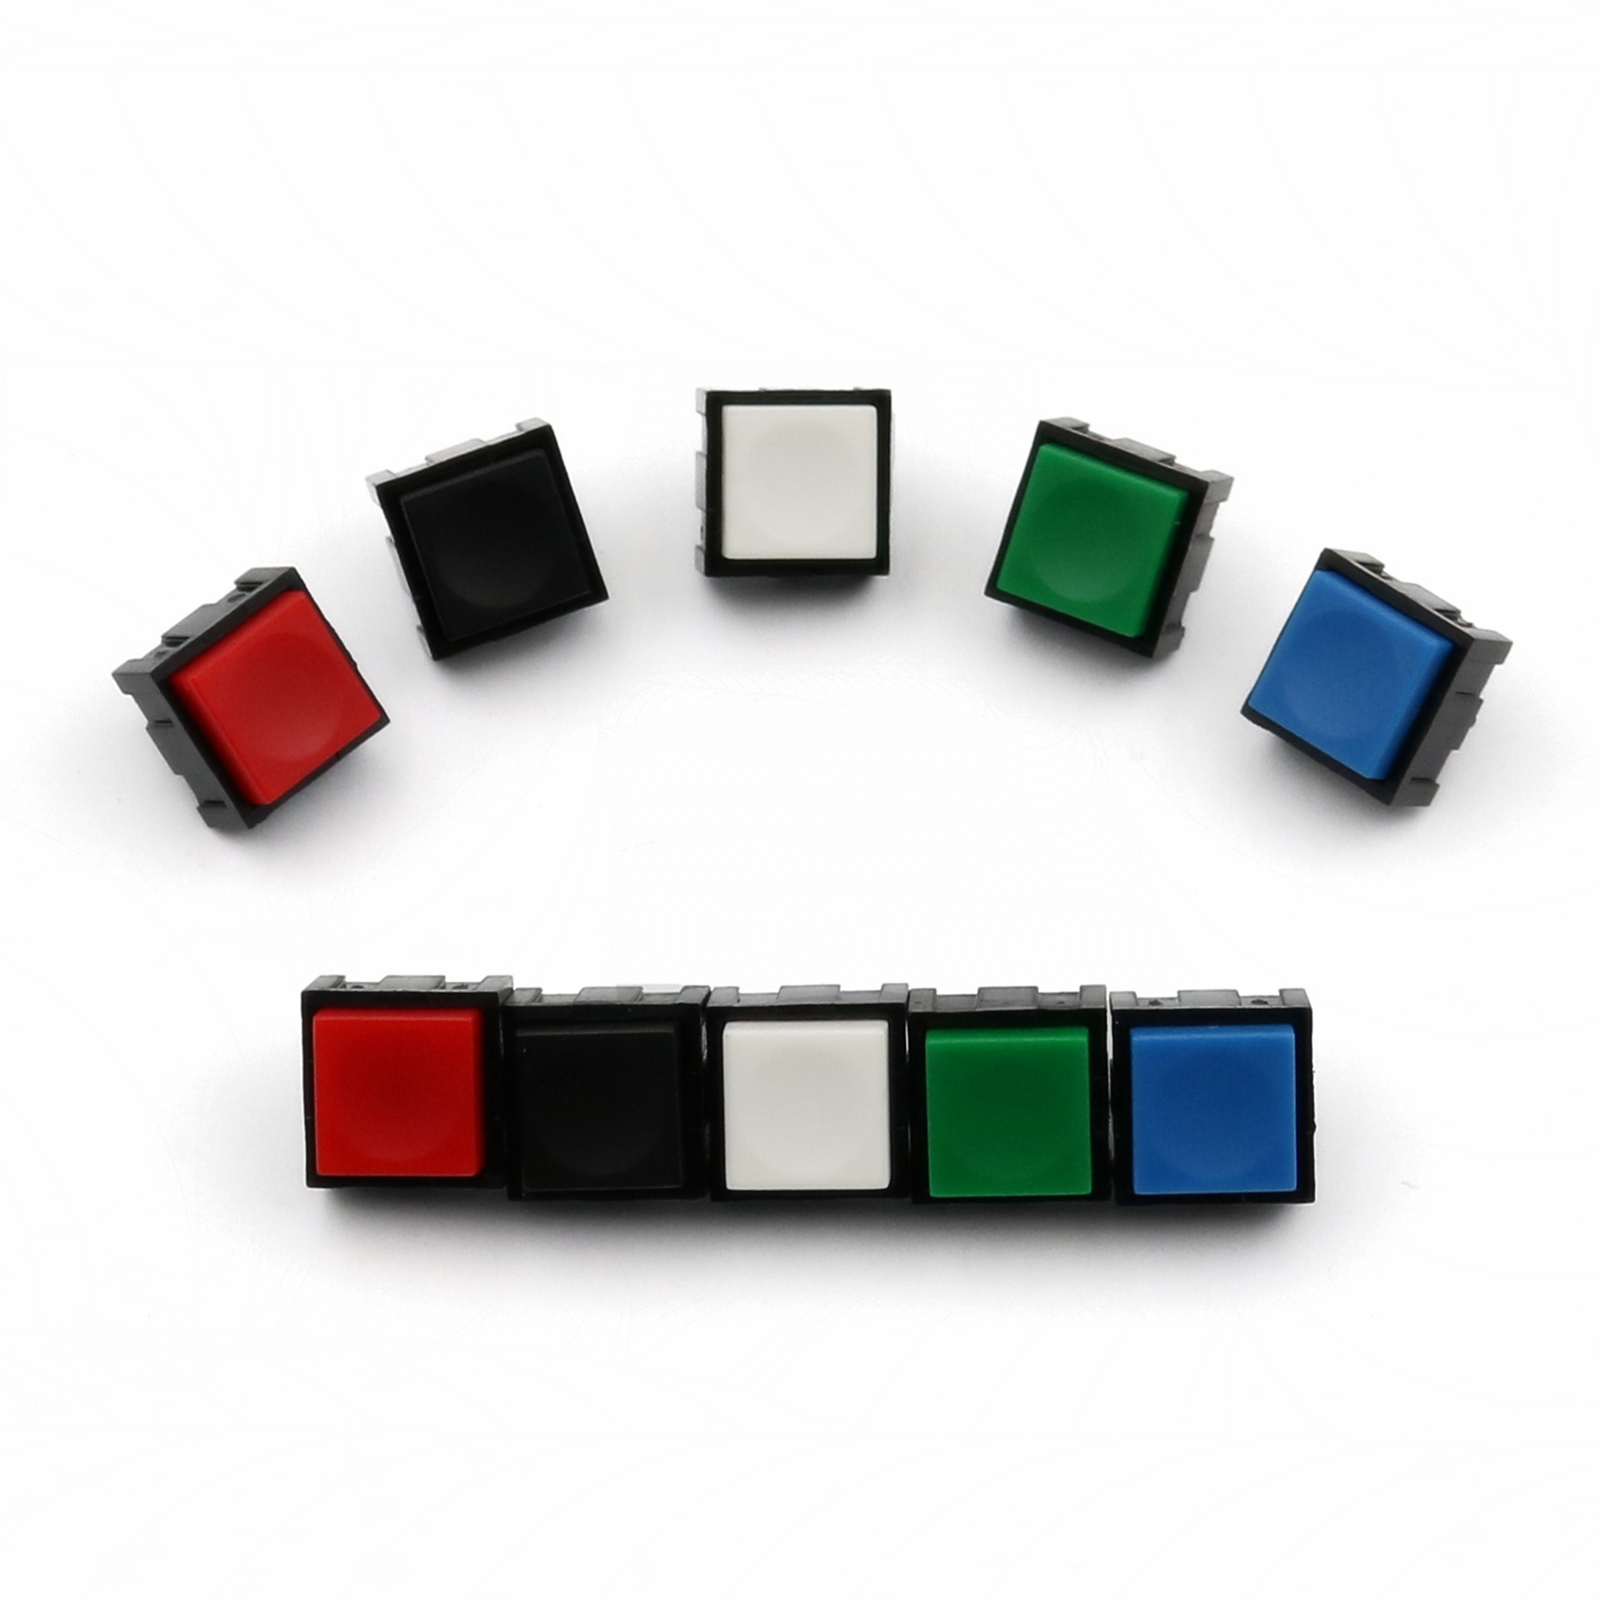 10Pcs PB13 Square 12*12mm Momentary 2Pin OFF-MOM SPST PCB Mini Push Button Click Switch